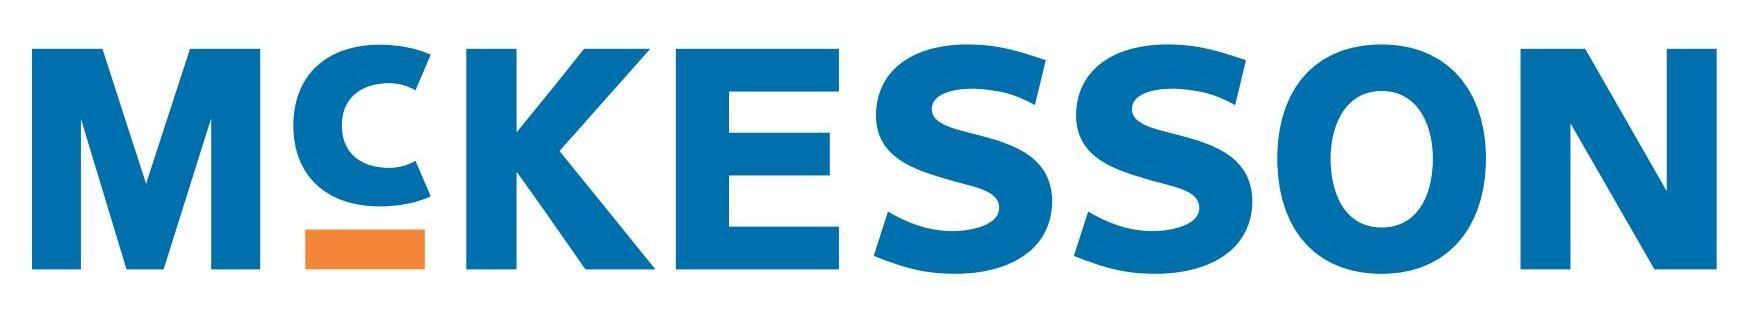 McKesson company logo